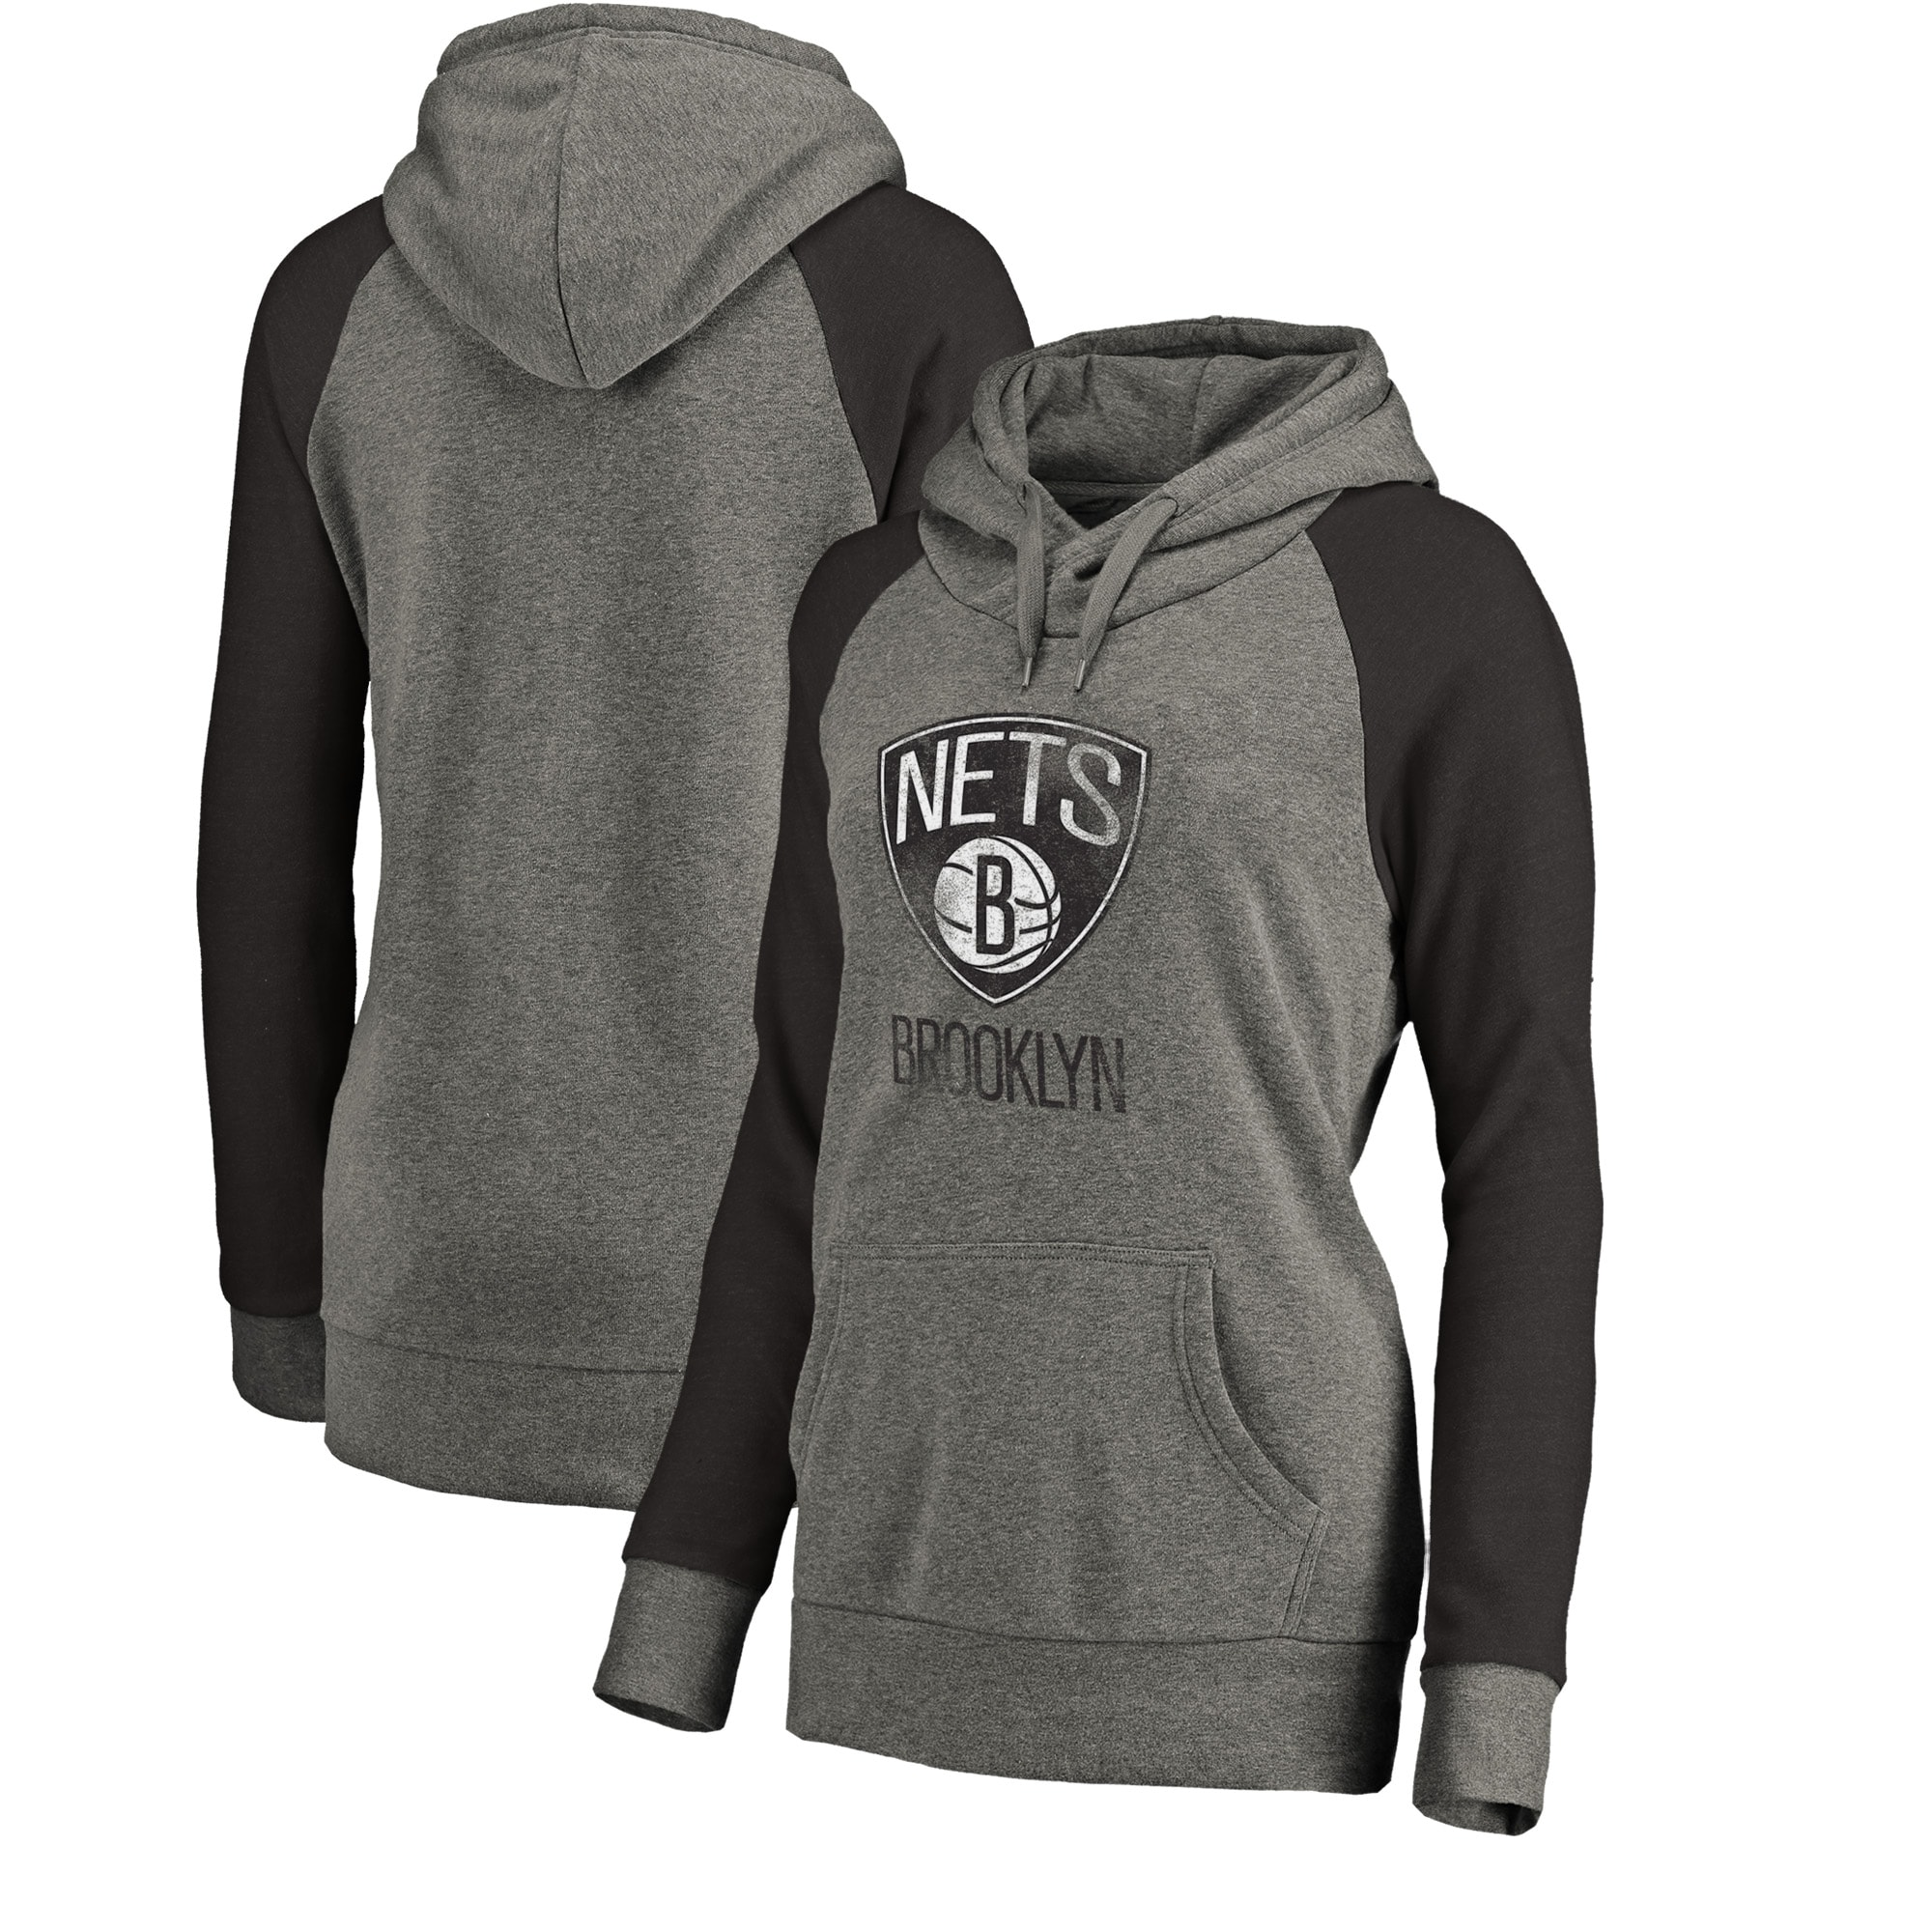 Brooklyn Nets Fanatics Branded Women's Distressed Logo Tri-Blend Pullover Hoodie - Ash/Black